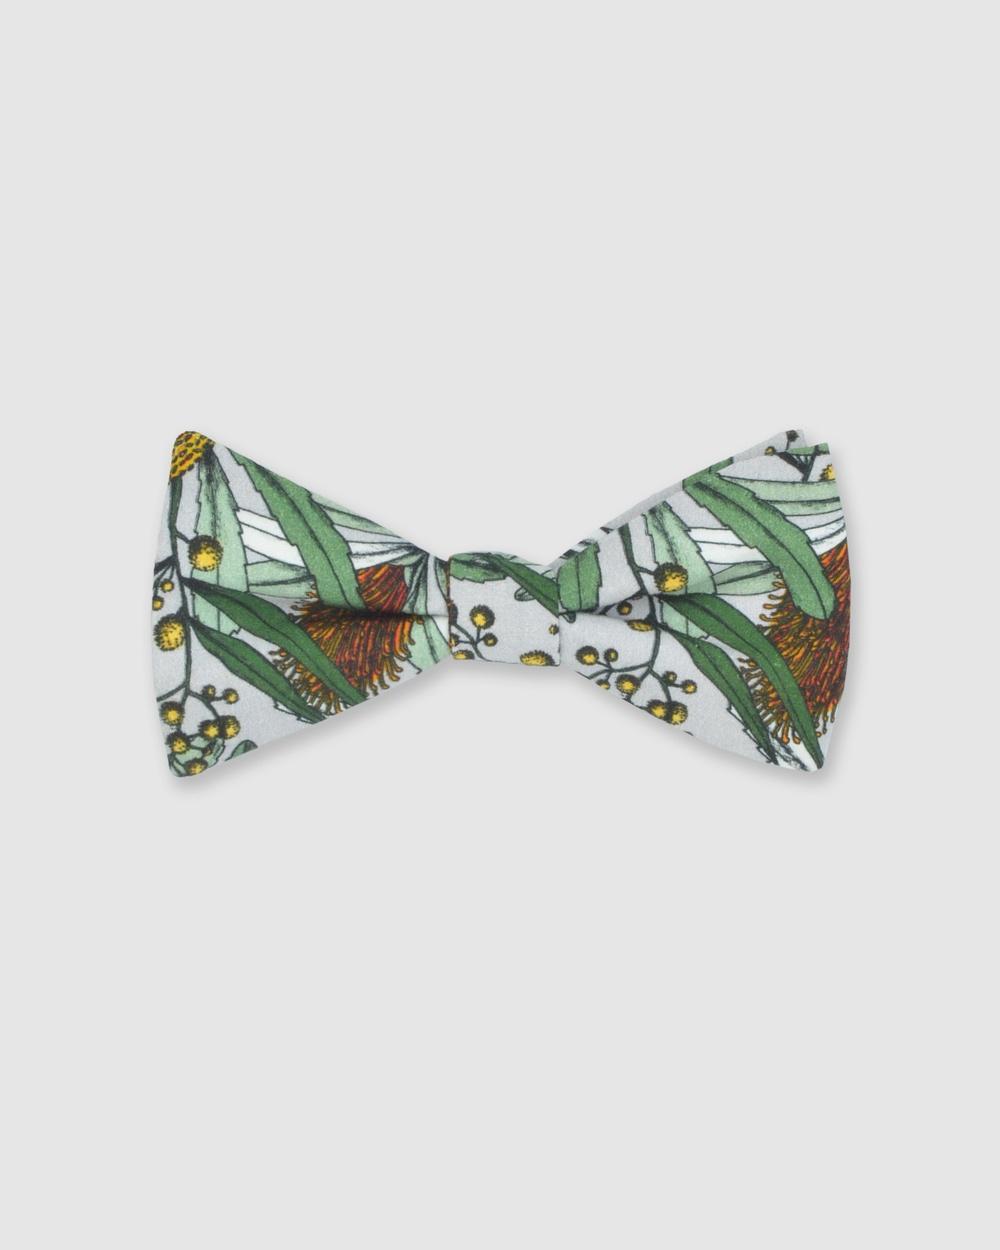 Peggy and Finn Banksia Bow Tie Ties & Cufflinks Grey Australia